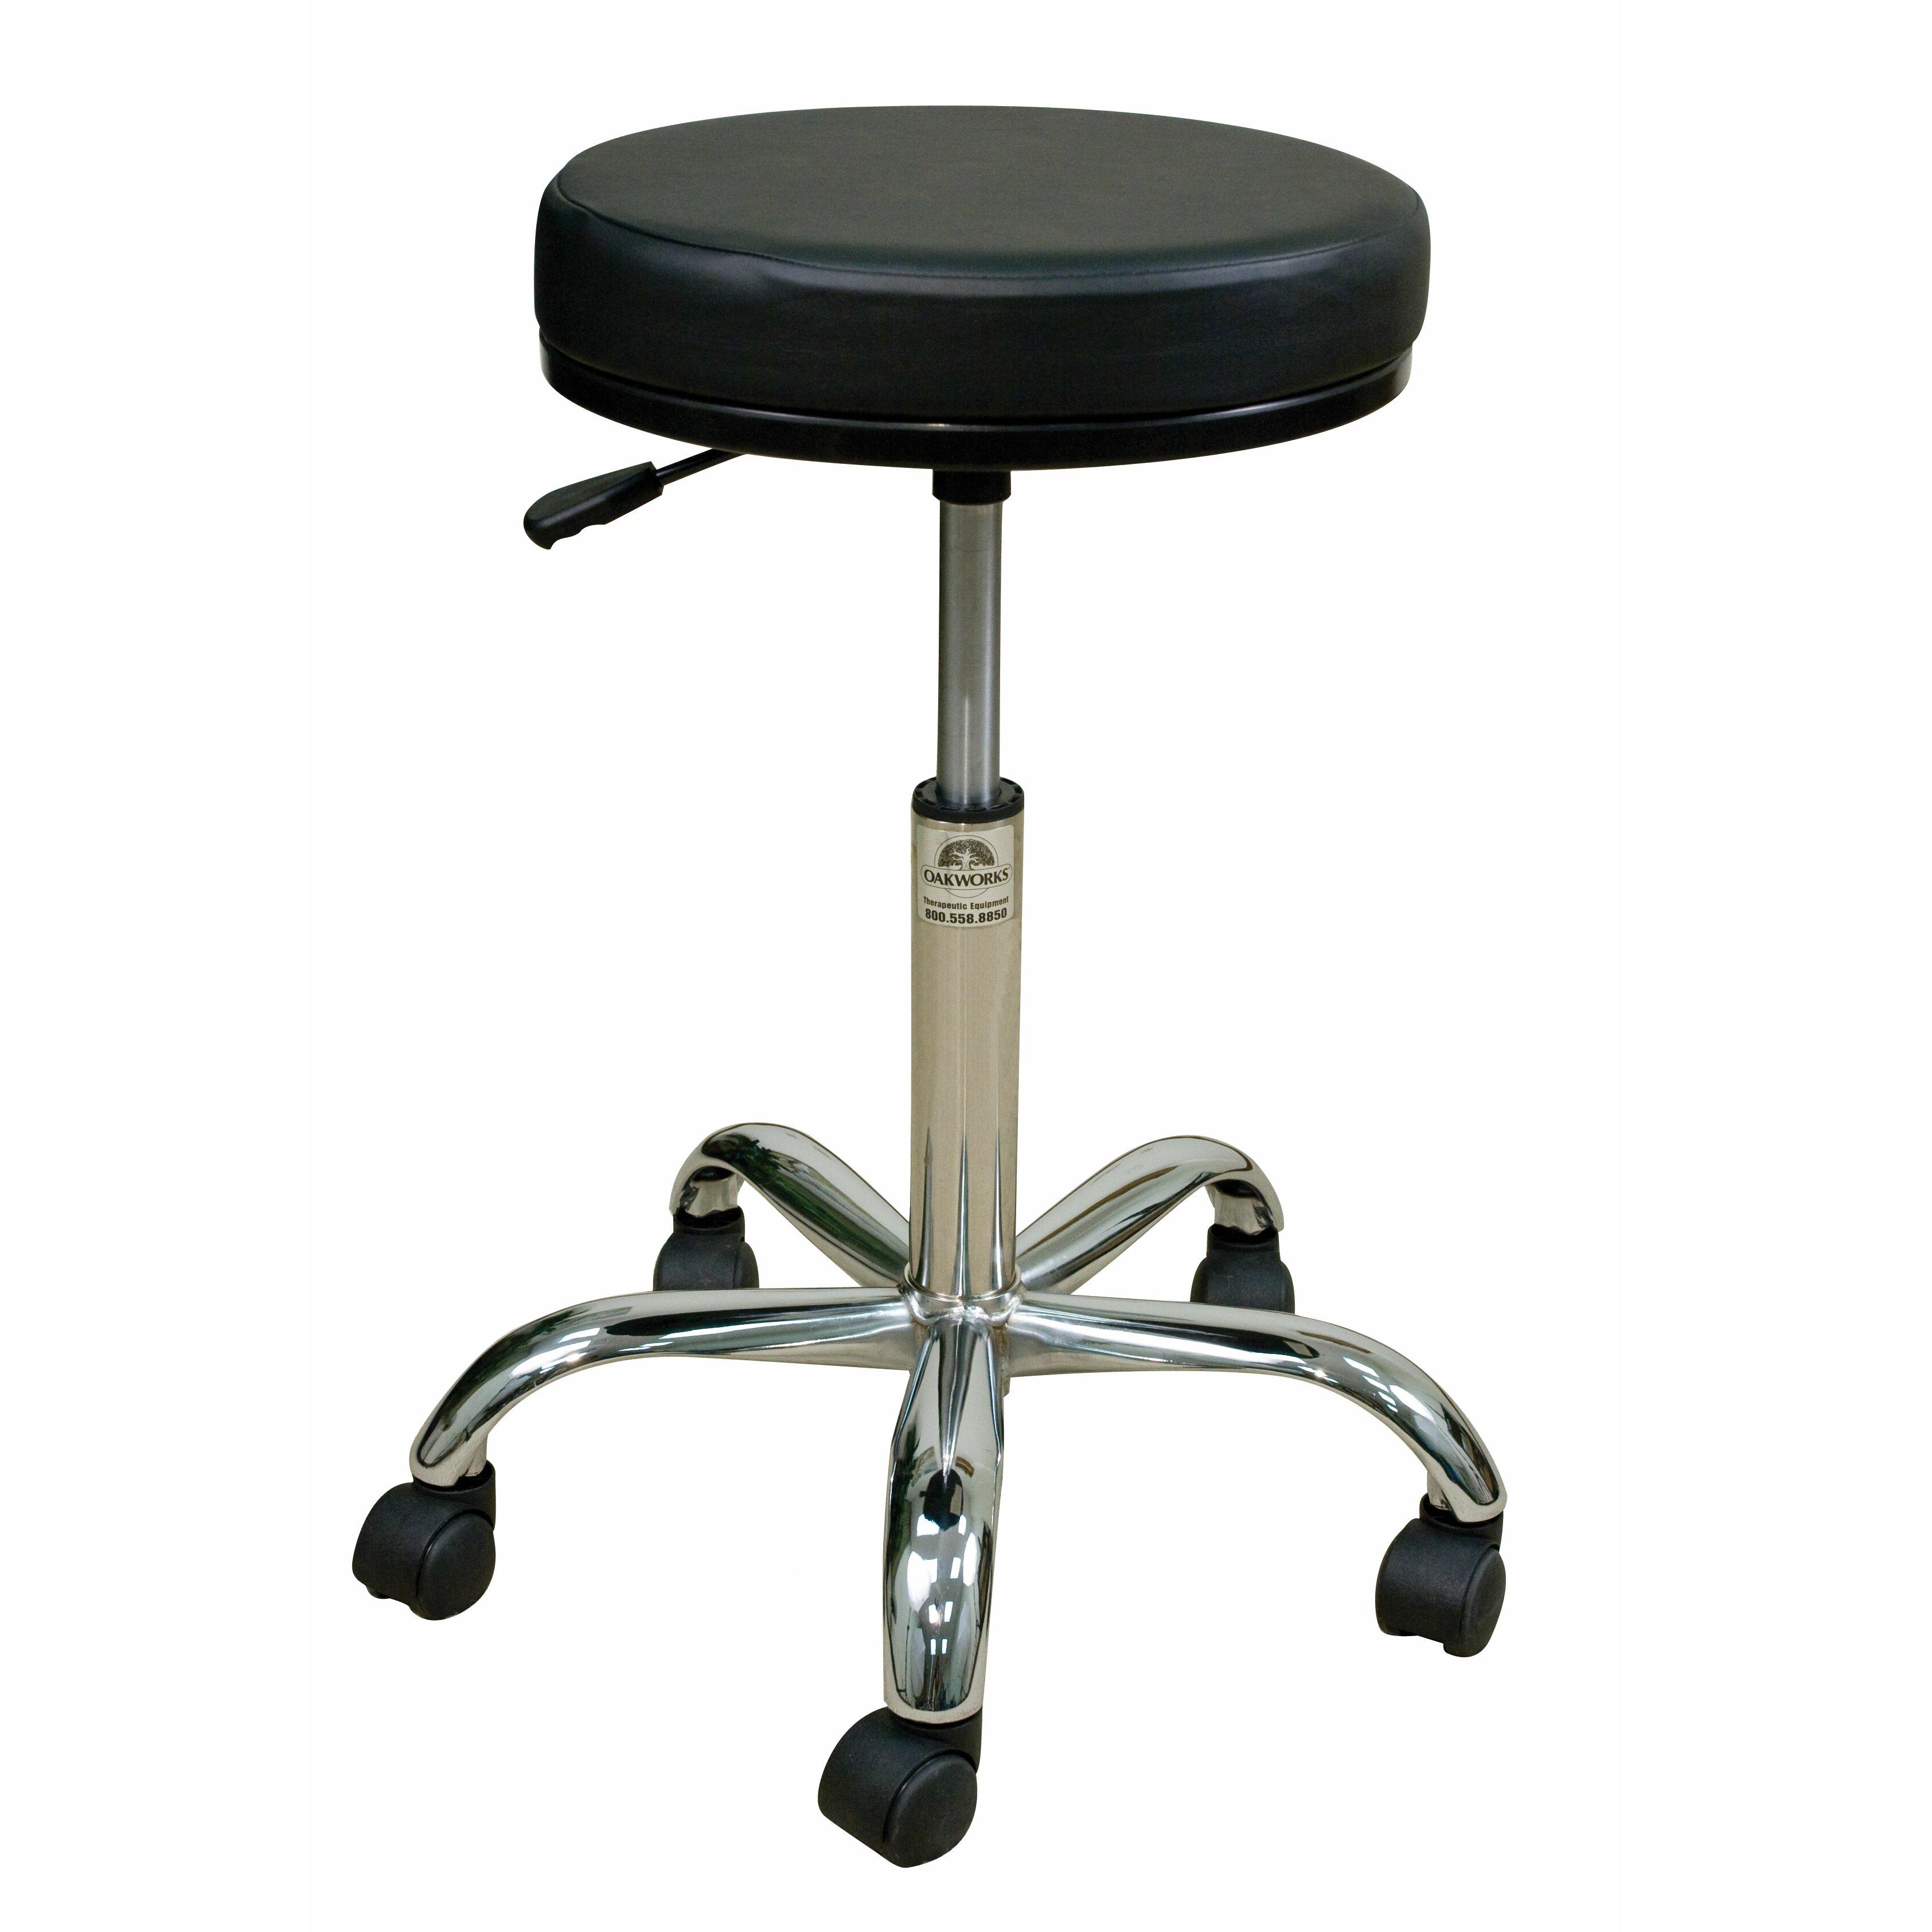 image quarter bamboo bathroom stool oakworks height adjustable professional stool with swivel seat